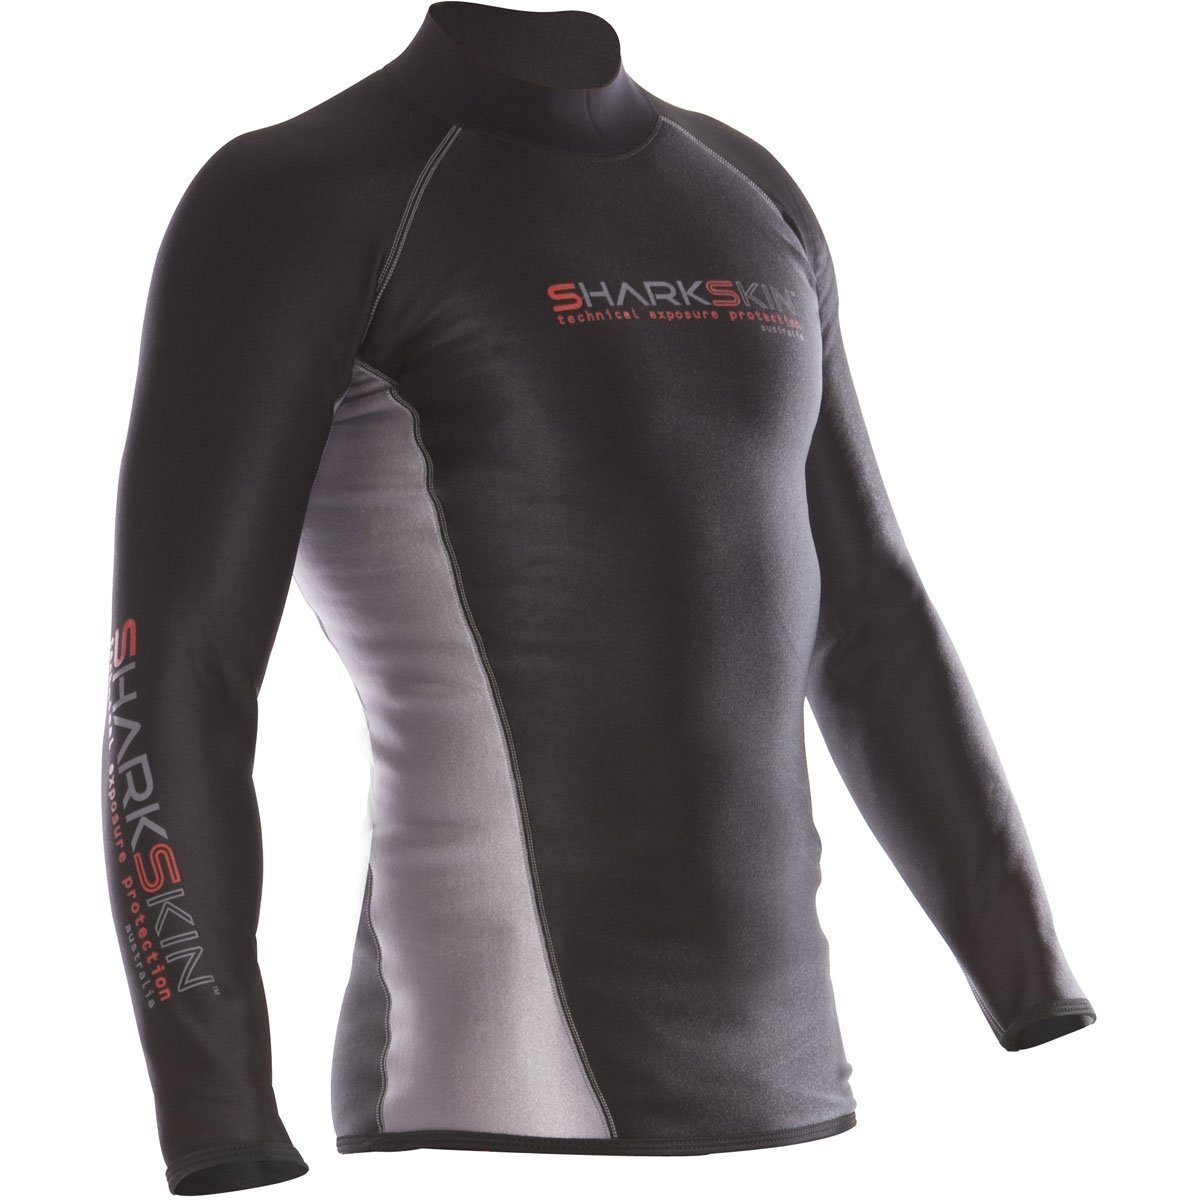 Sharkskin Men's Chillproof Long Sleeve Shirt Wetsuit, Black, X-Large by Sharkskin